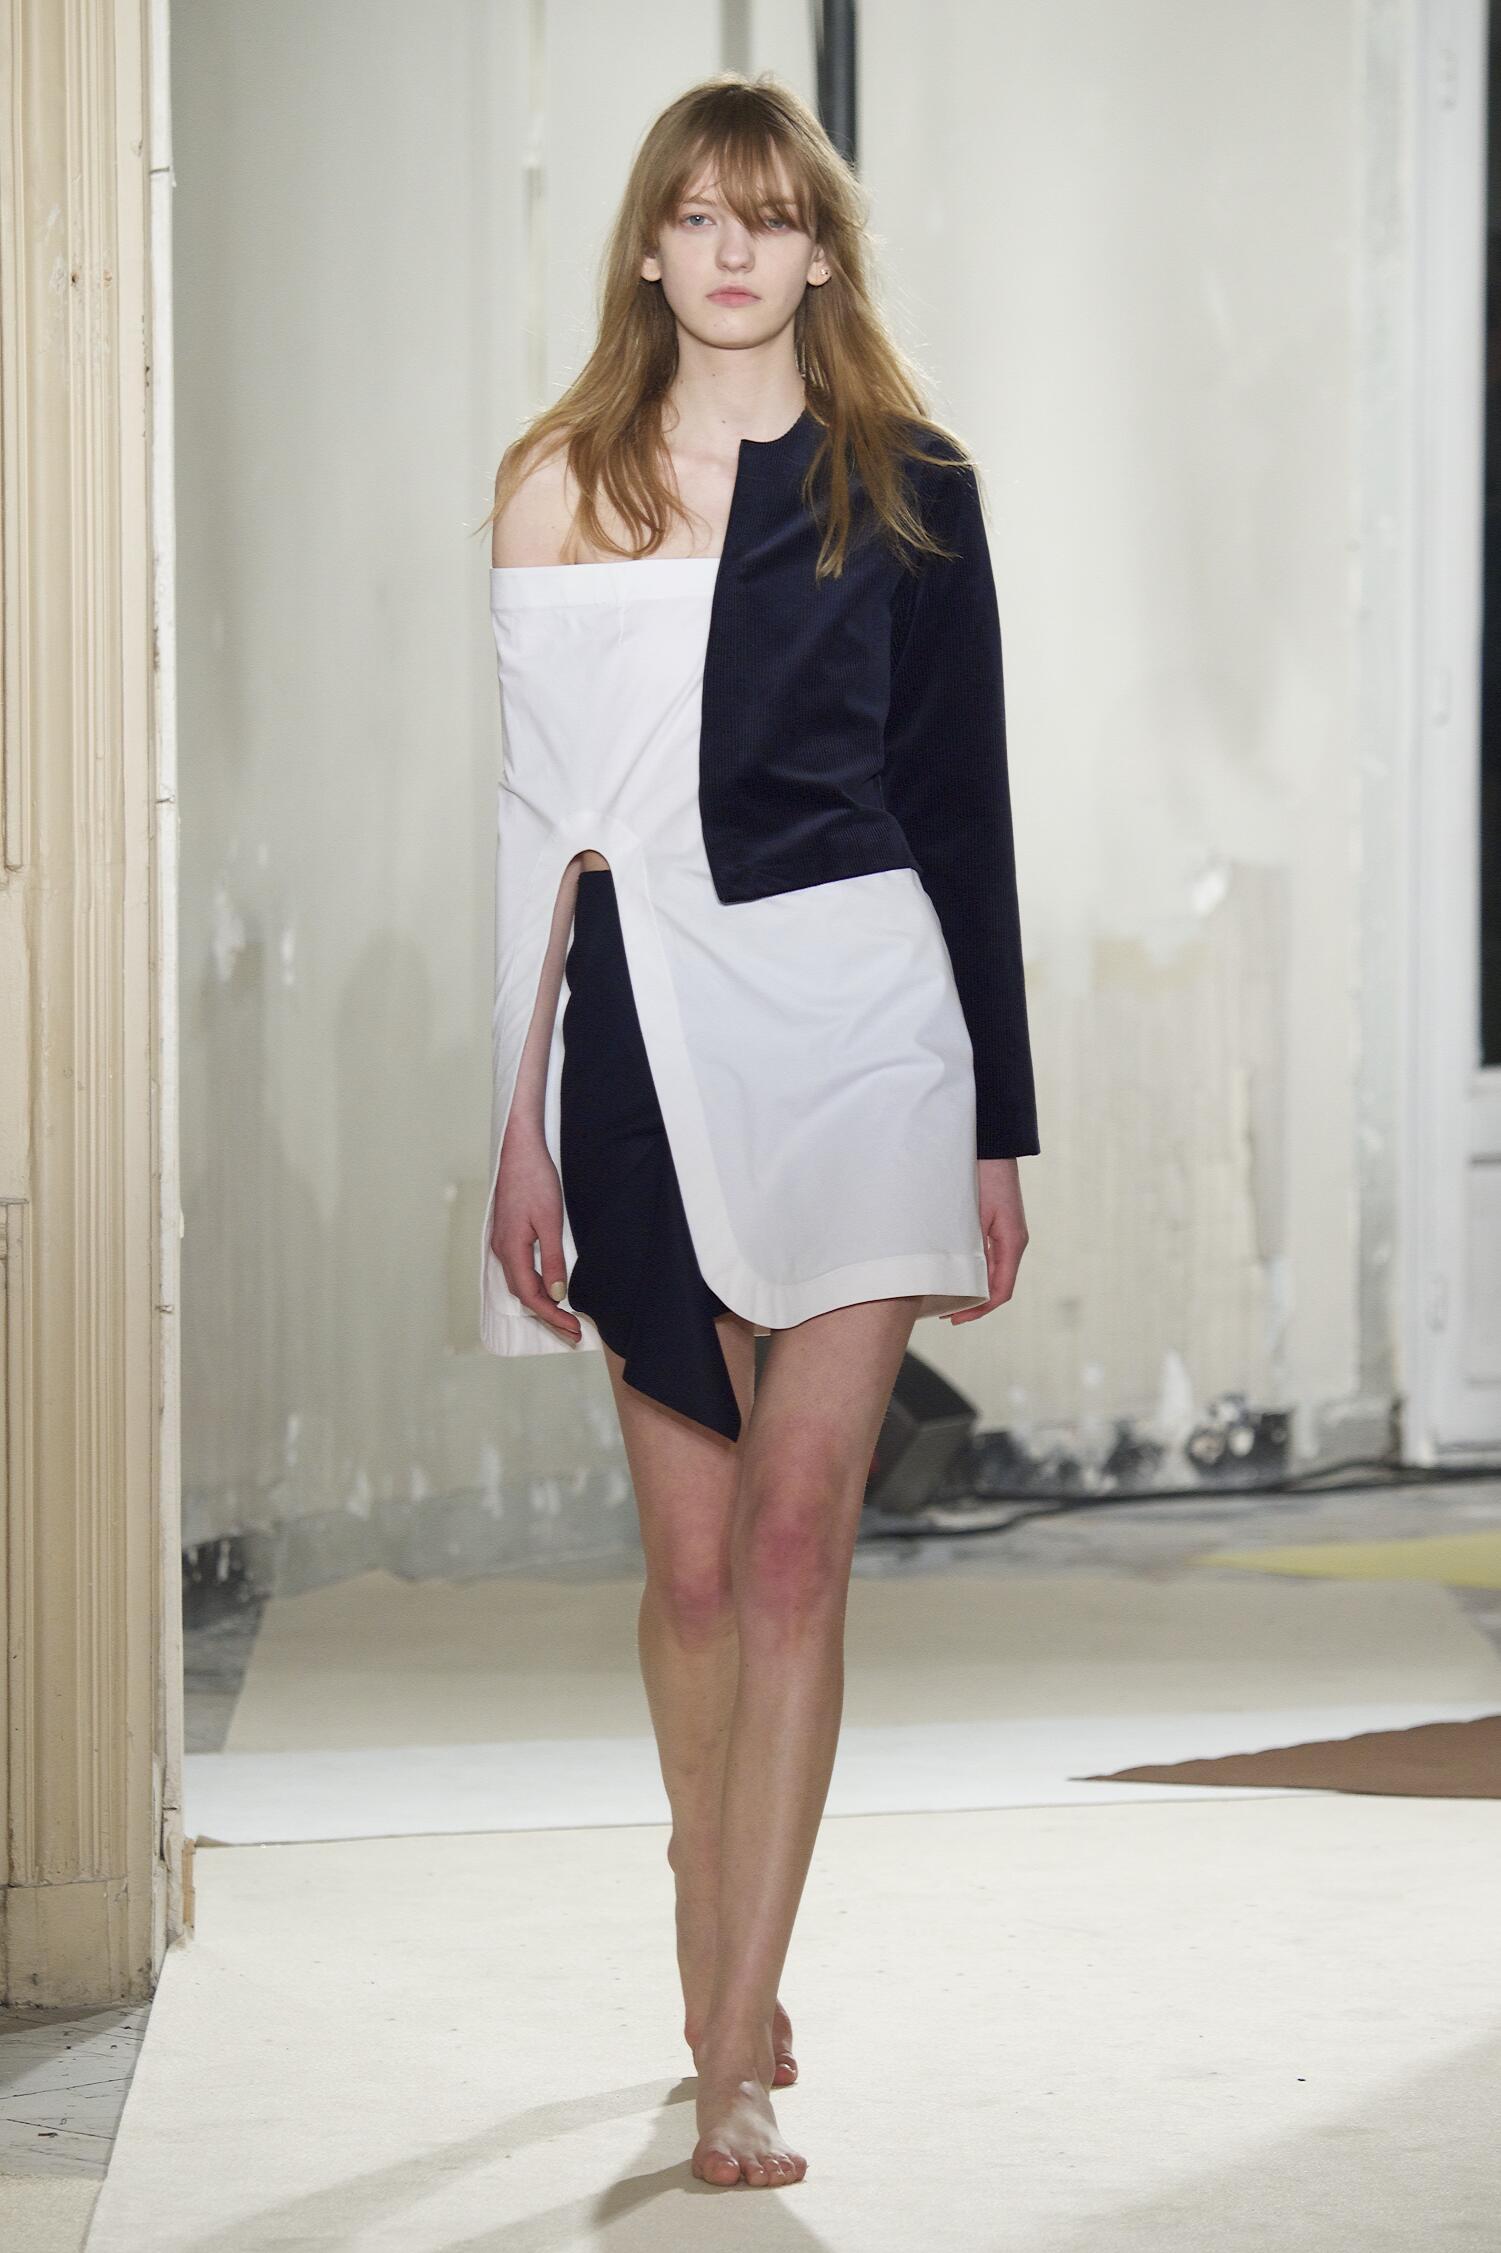 Catwalk Jacquemus Fall Winter 2015 16 Women's Collection Paris Fashion Week